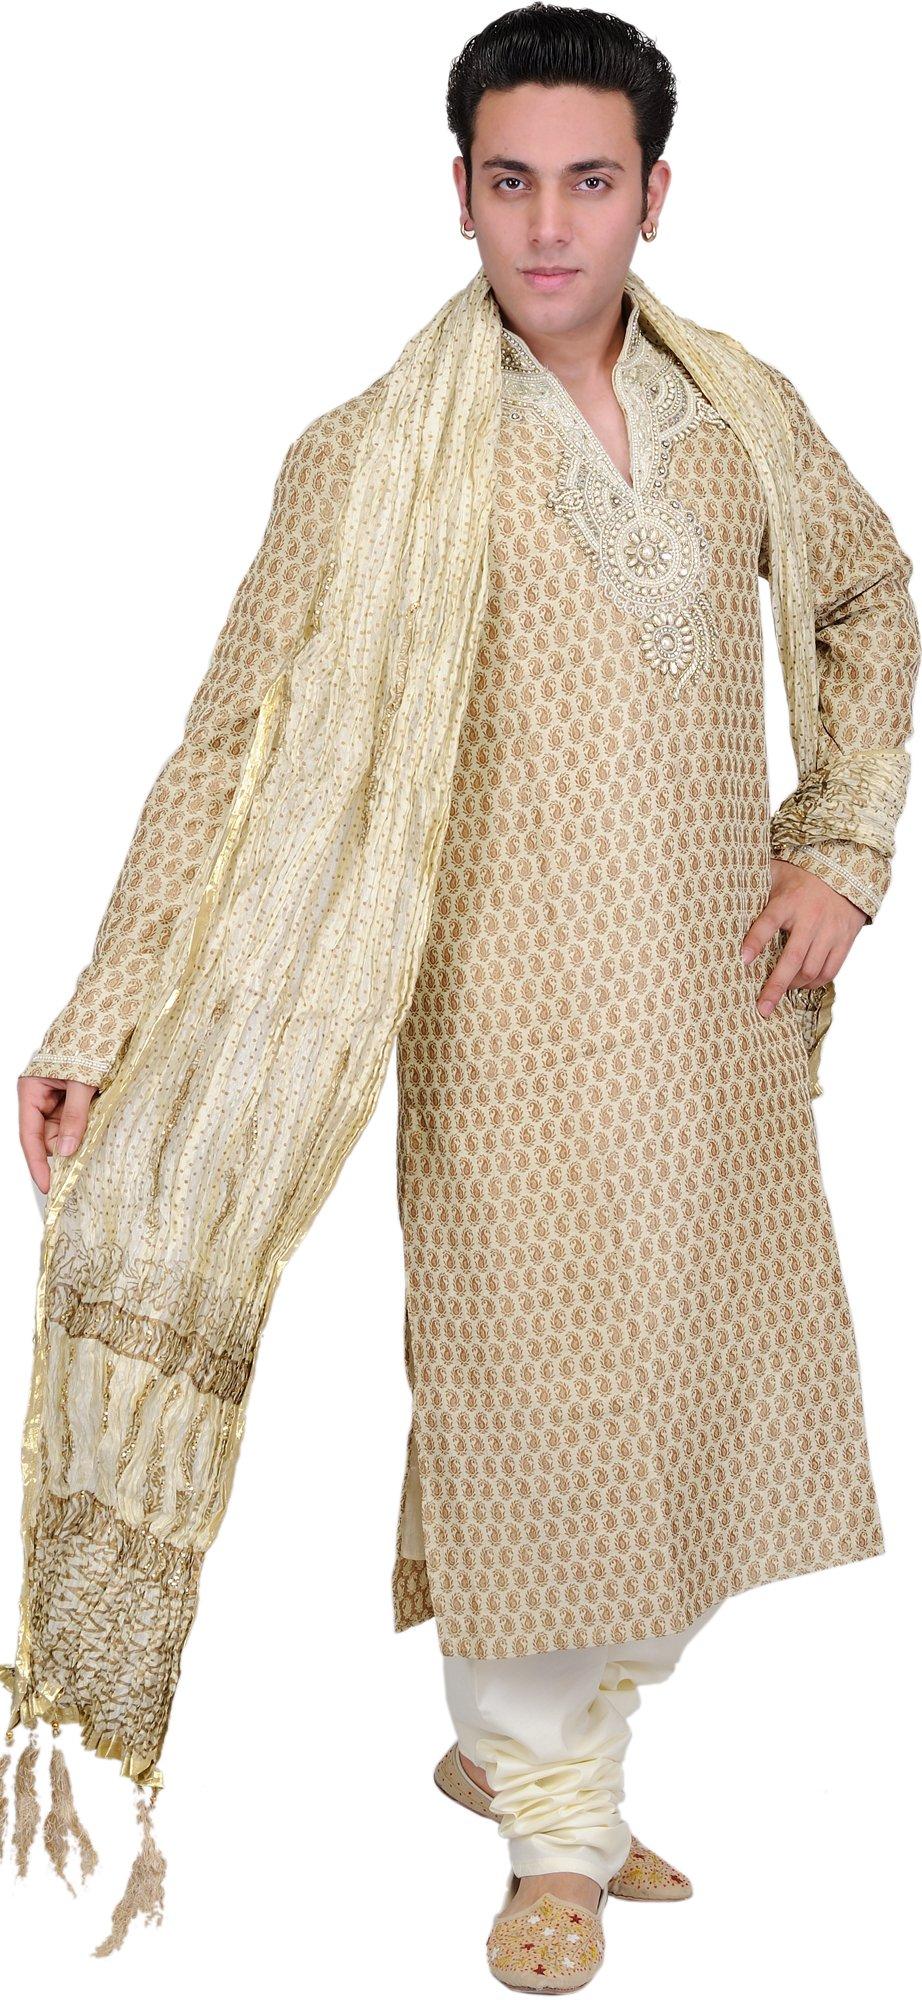 Exotic India Golden-Beige Wedding Kurta Pajama with Bro Size 42